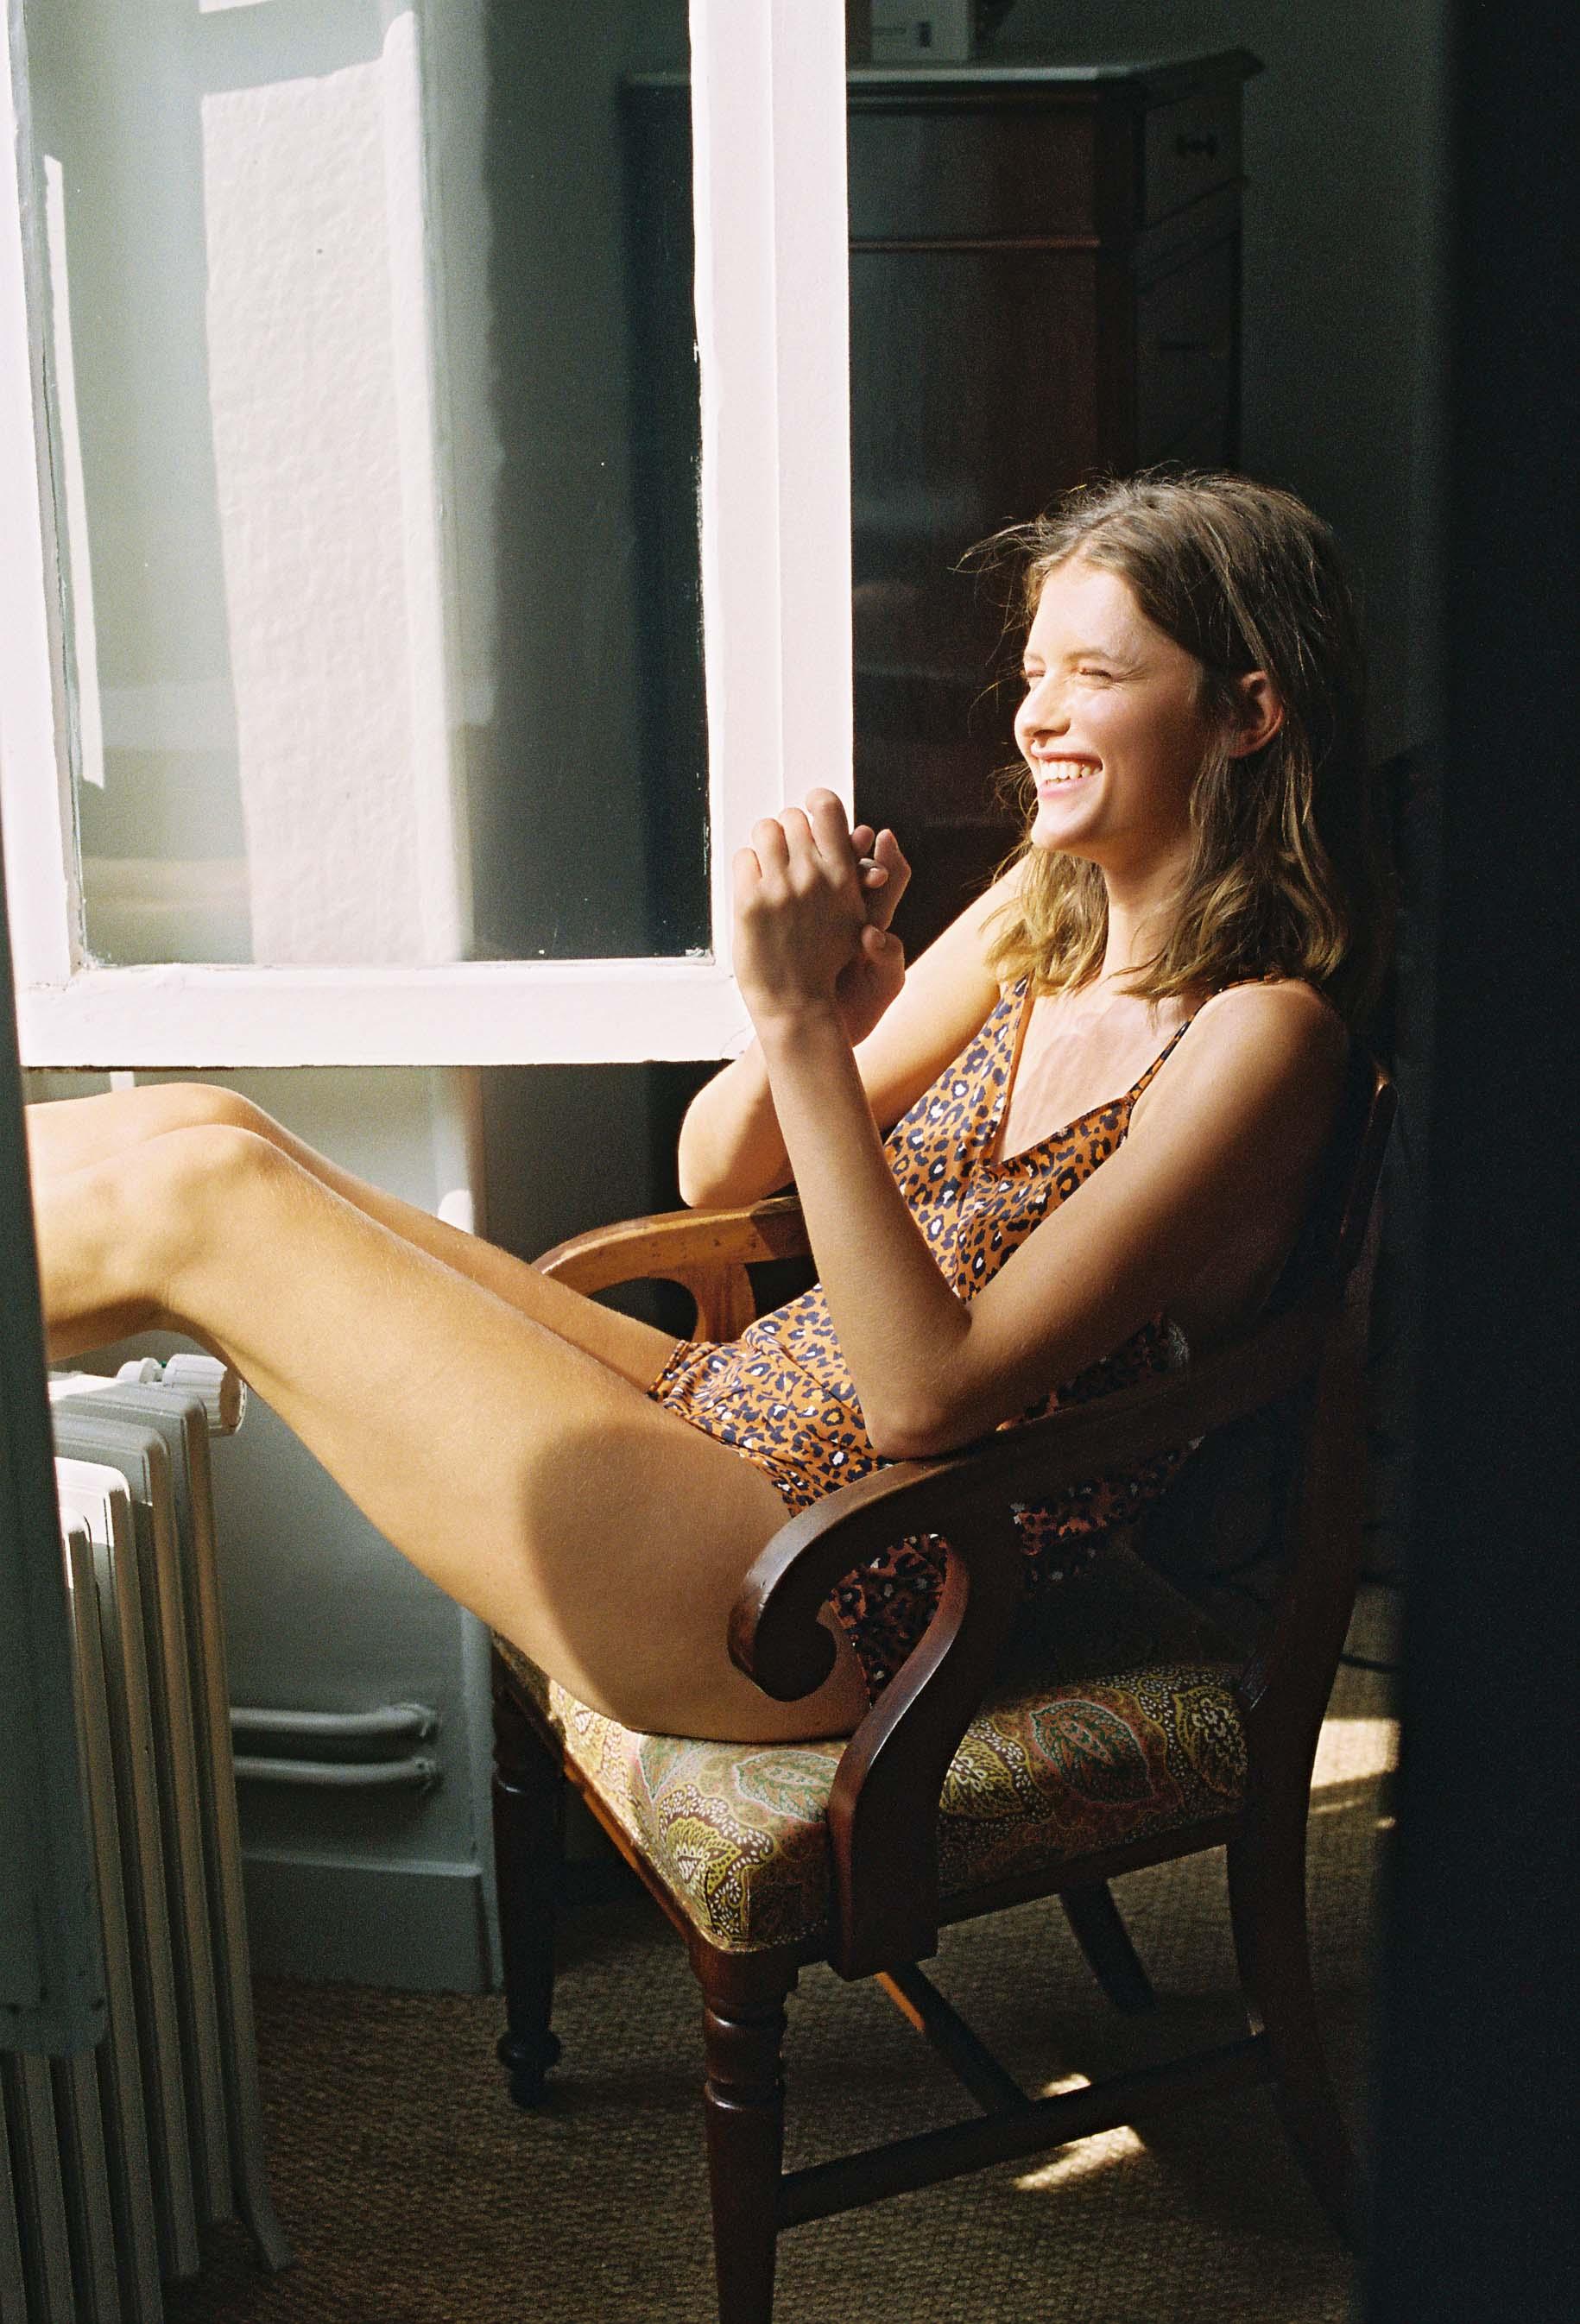 lingerie teddy Spice Mush 49 € Girls In Paris photo 3